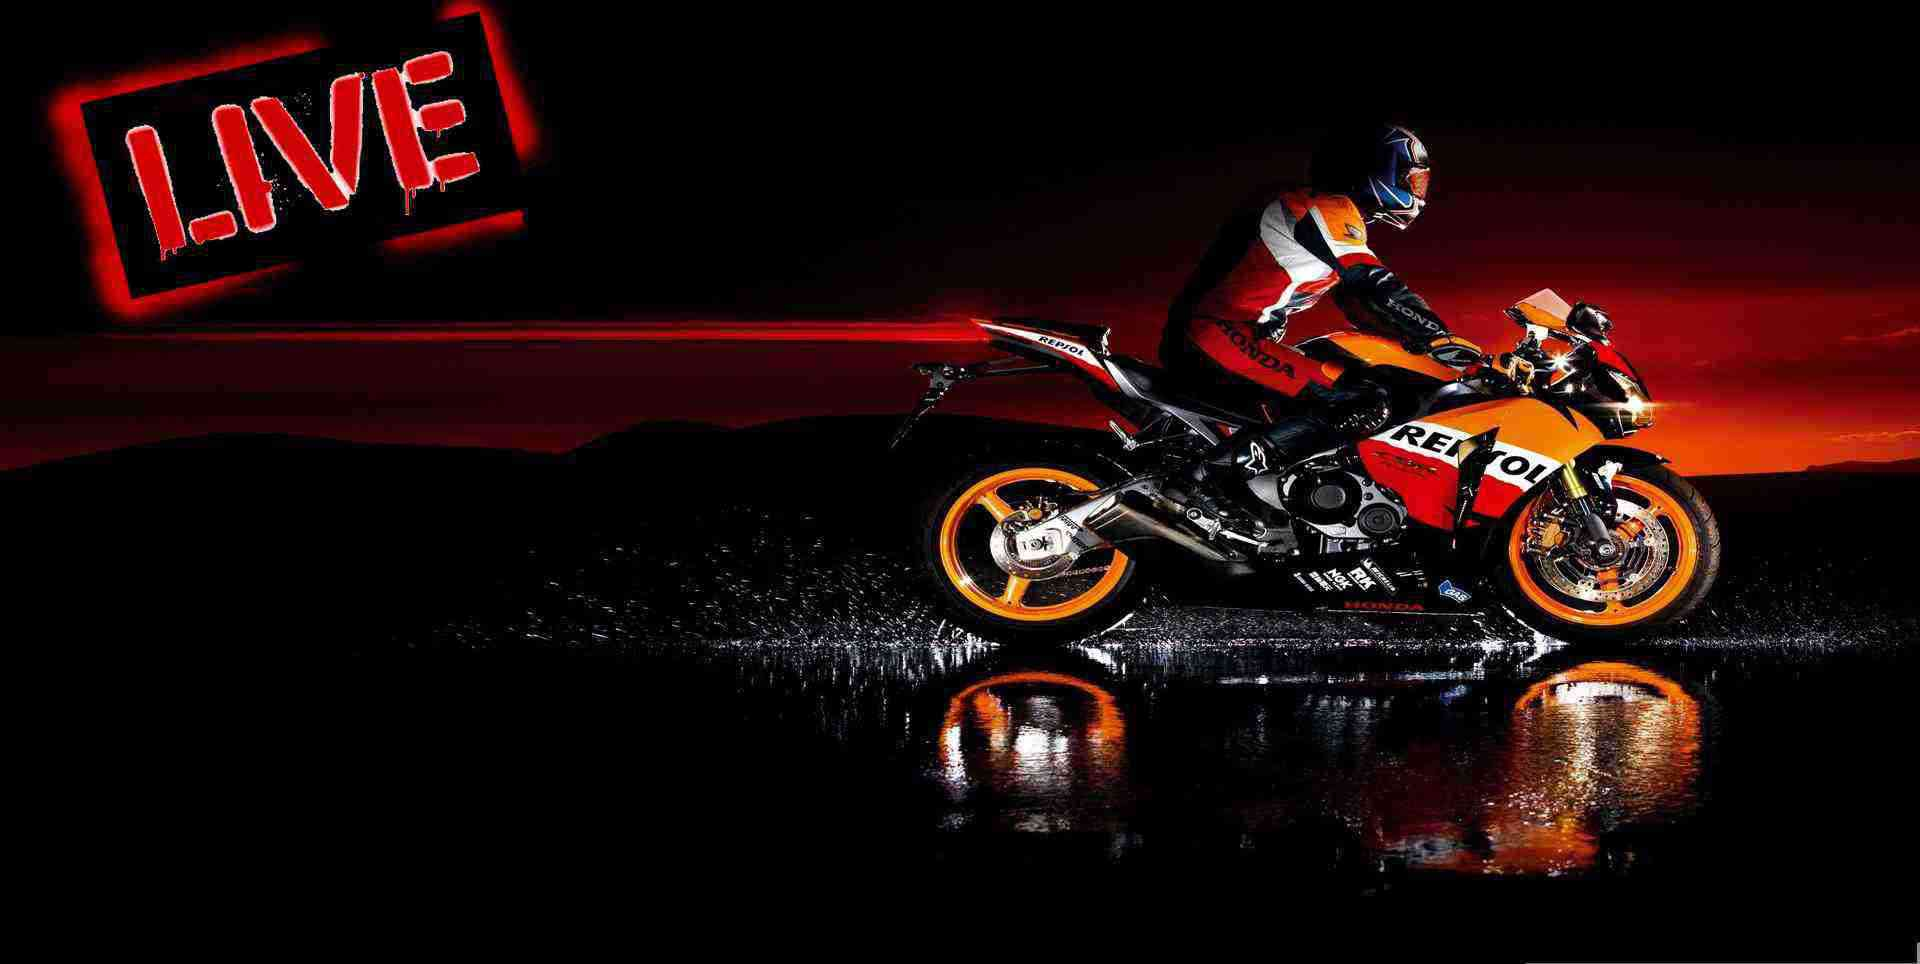 Valencia GP Moto3 FP1 Live Stream